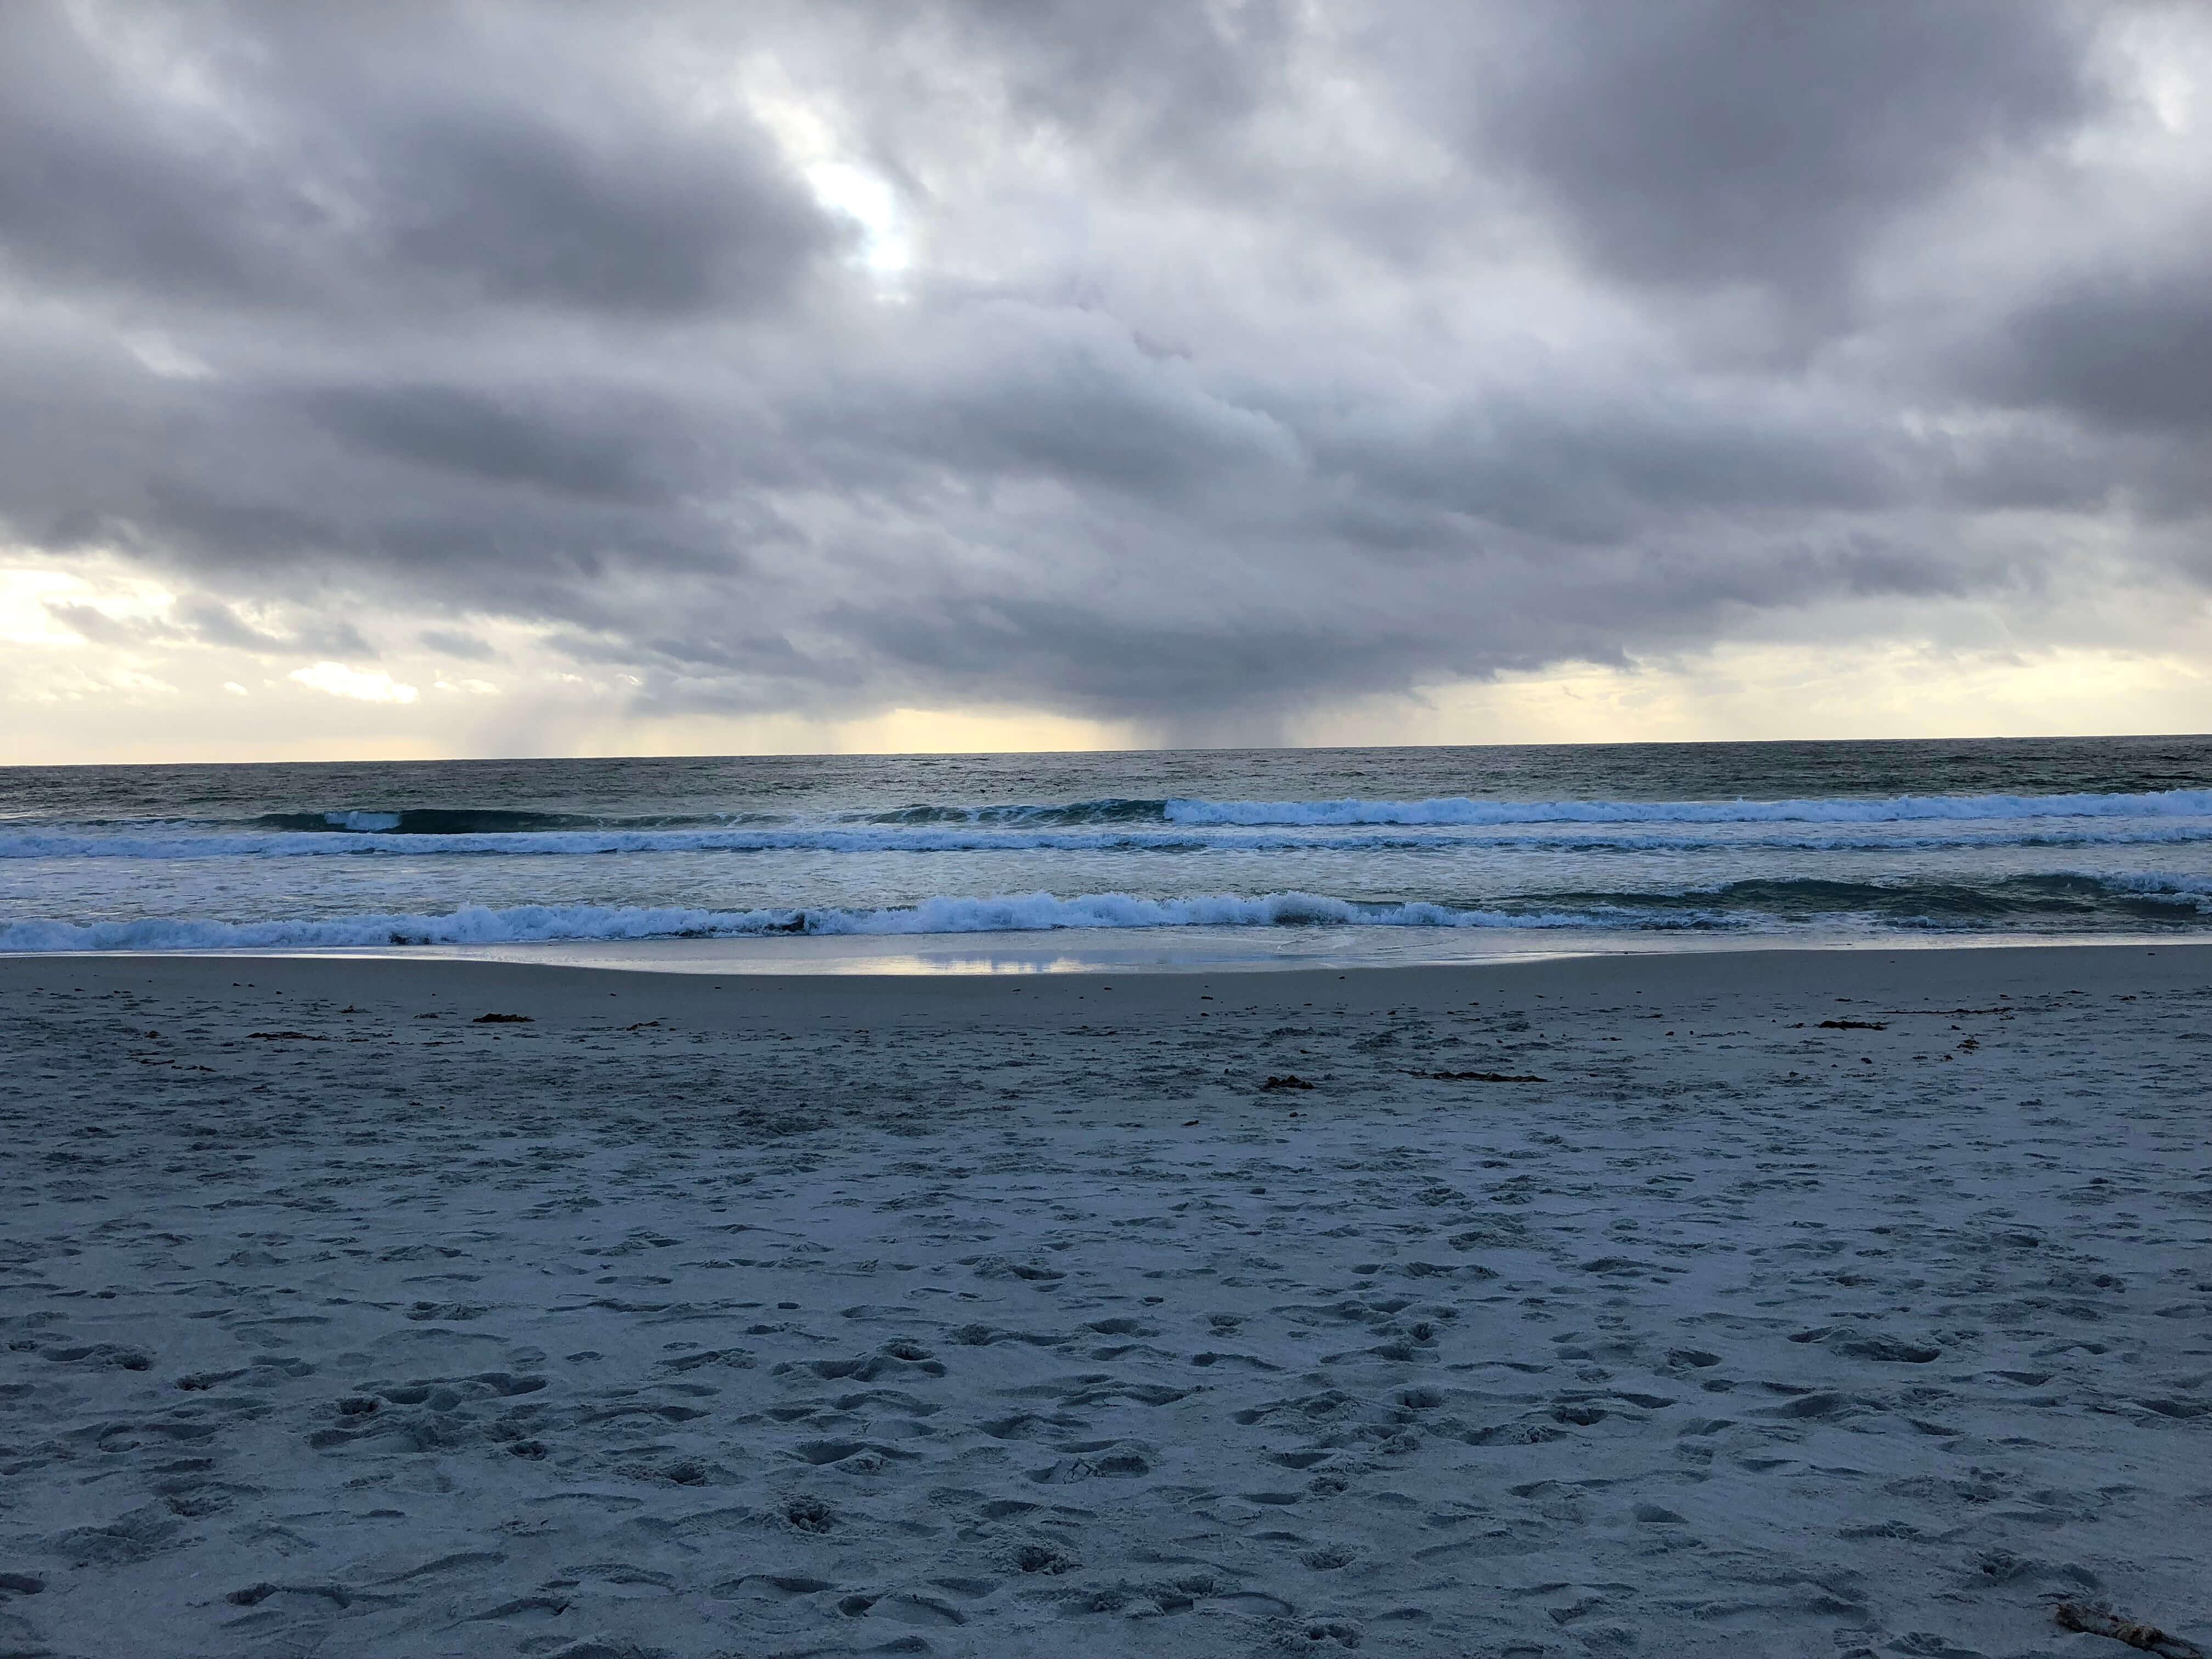 carmel-by-the-sea beach